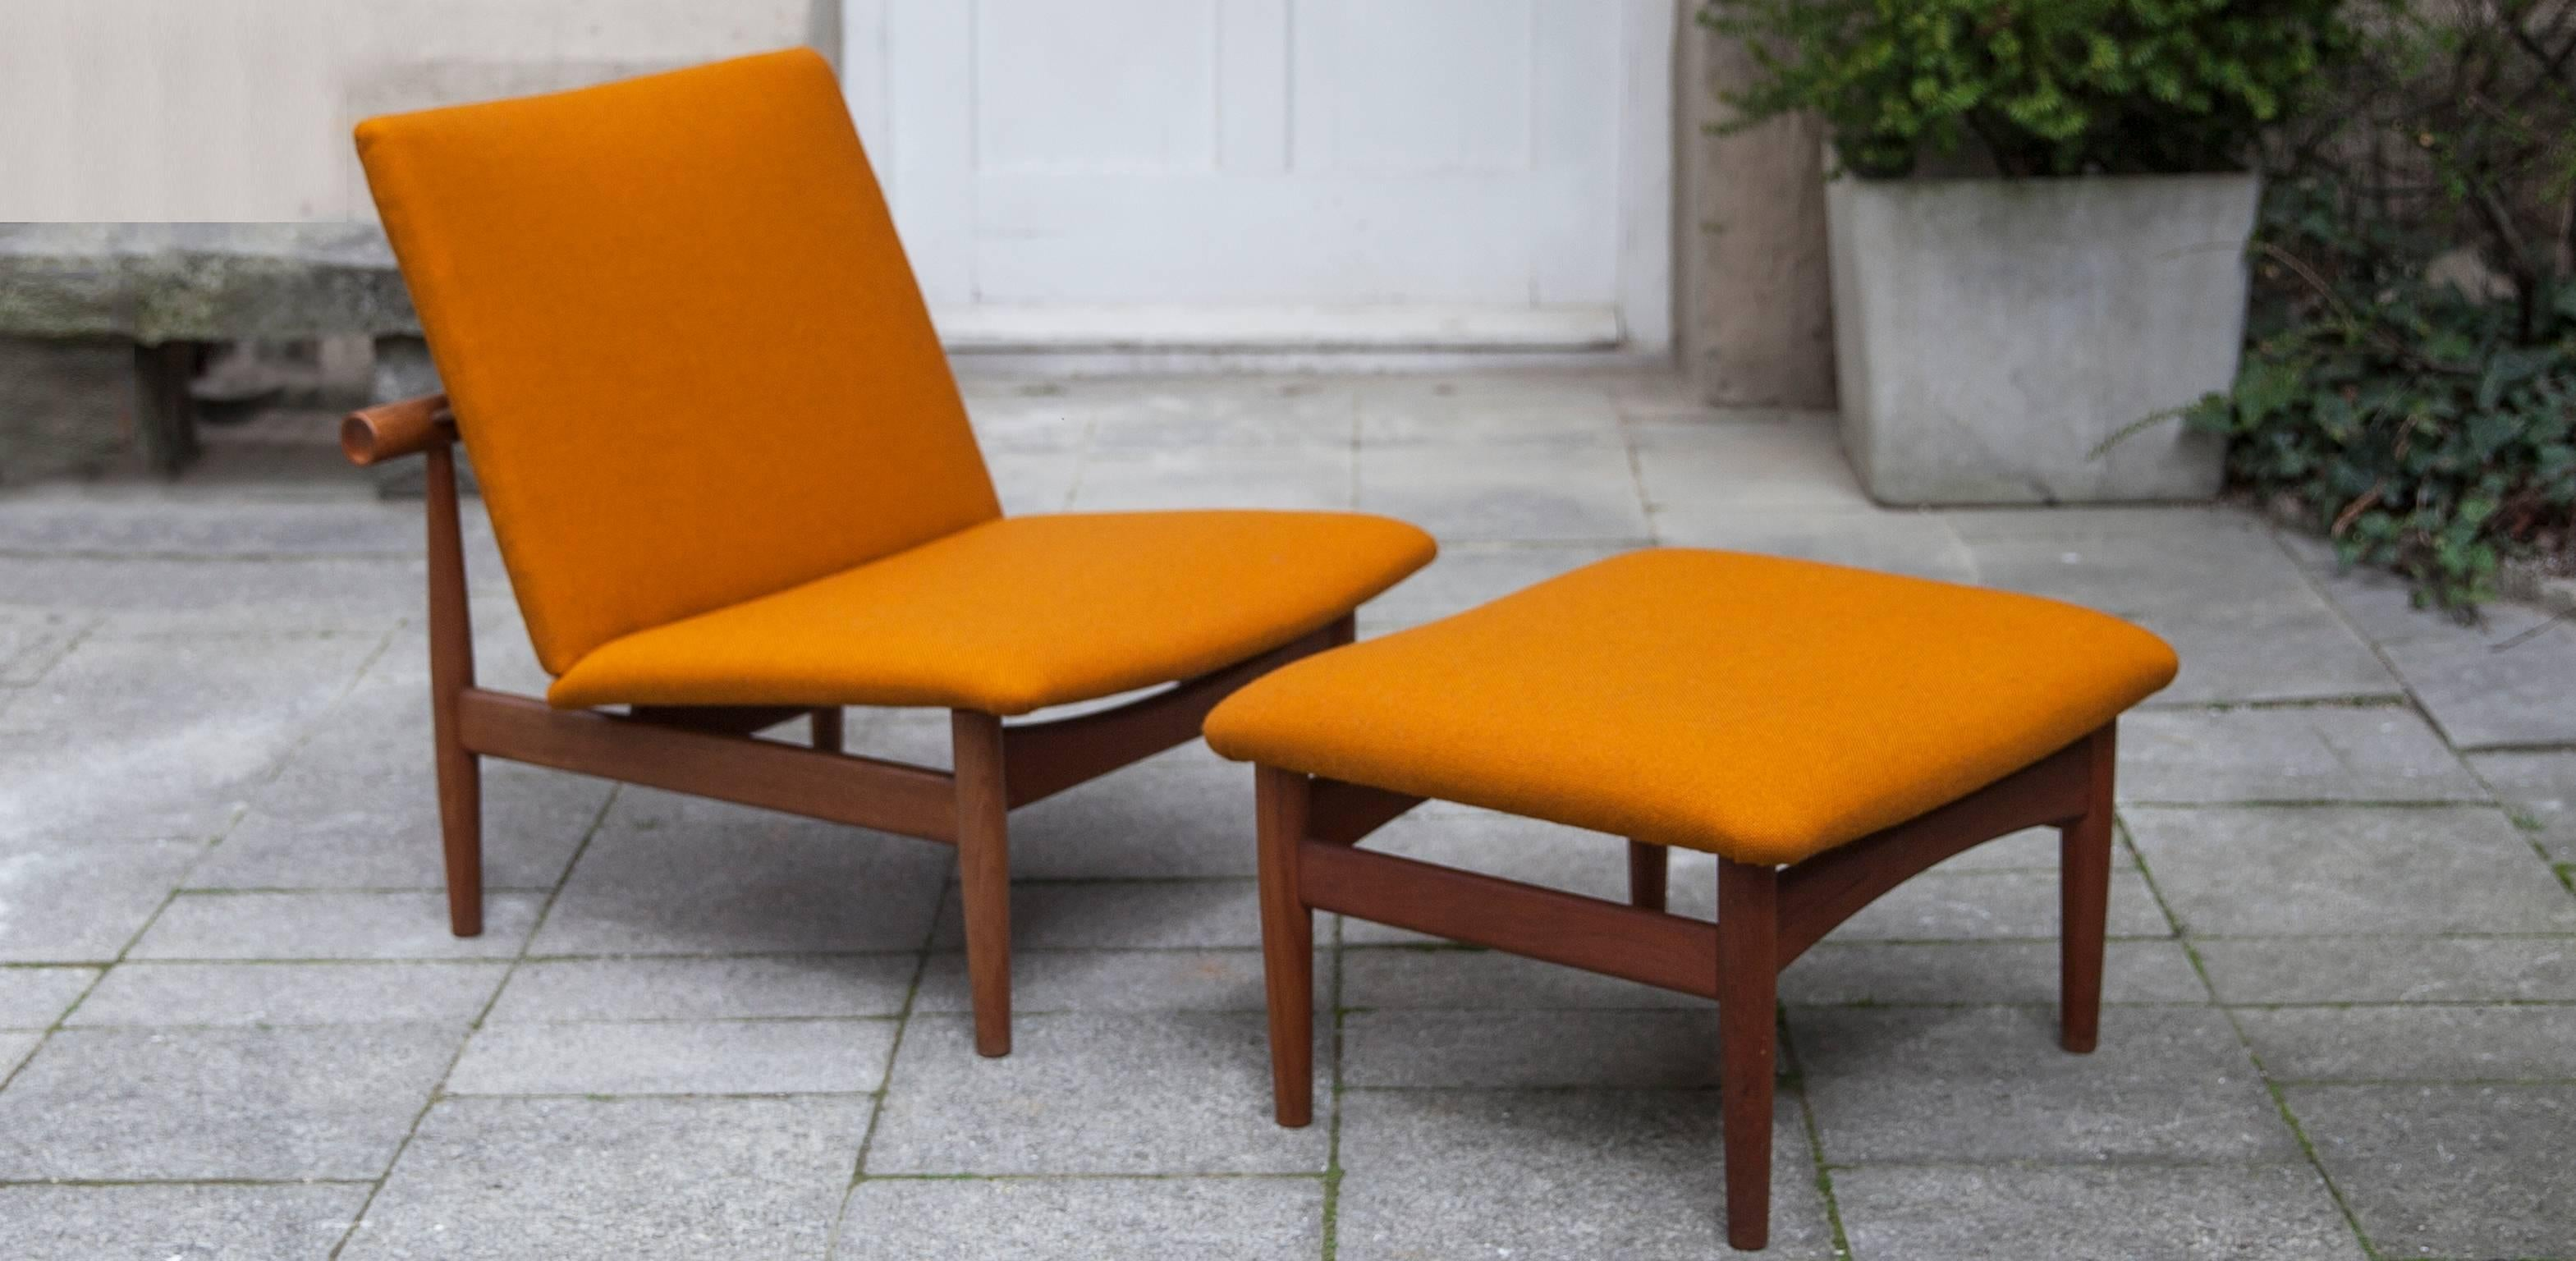 Rare Finn Juhl lounge chair set model Japan / FD-137. The stool was & Finn Juhl Lounge Chair Plus Ottoman Japan Series 1953 For Sale at ...